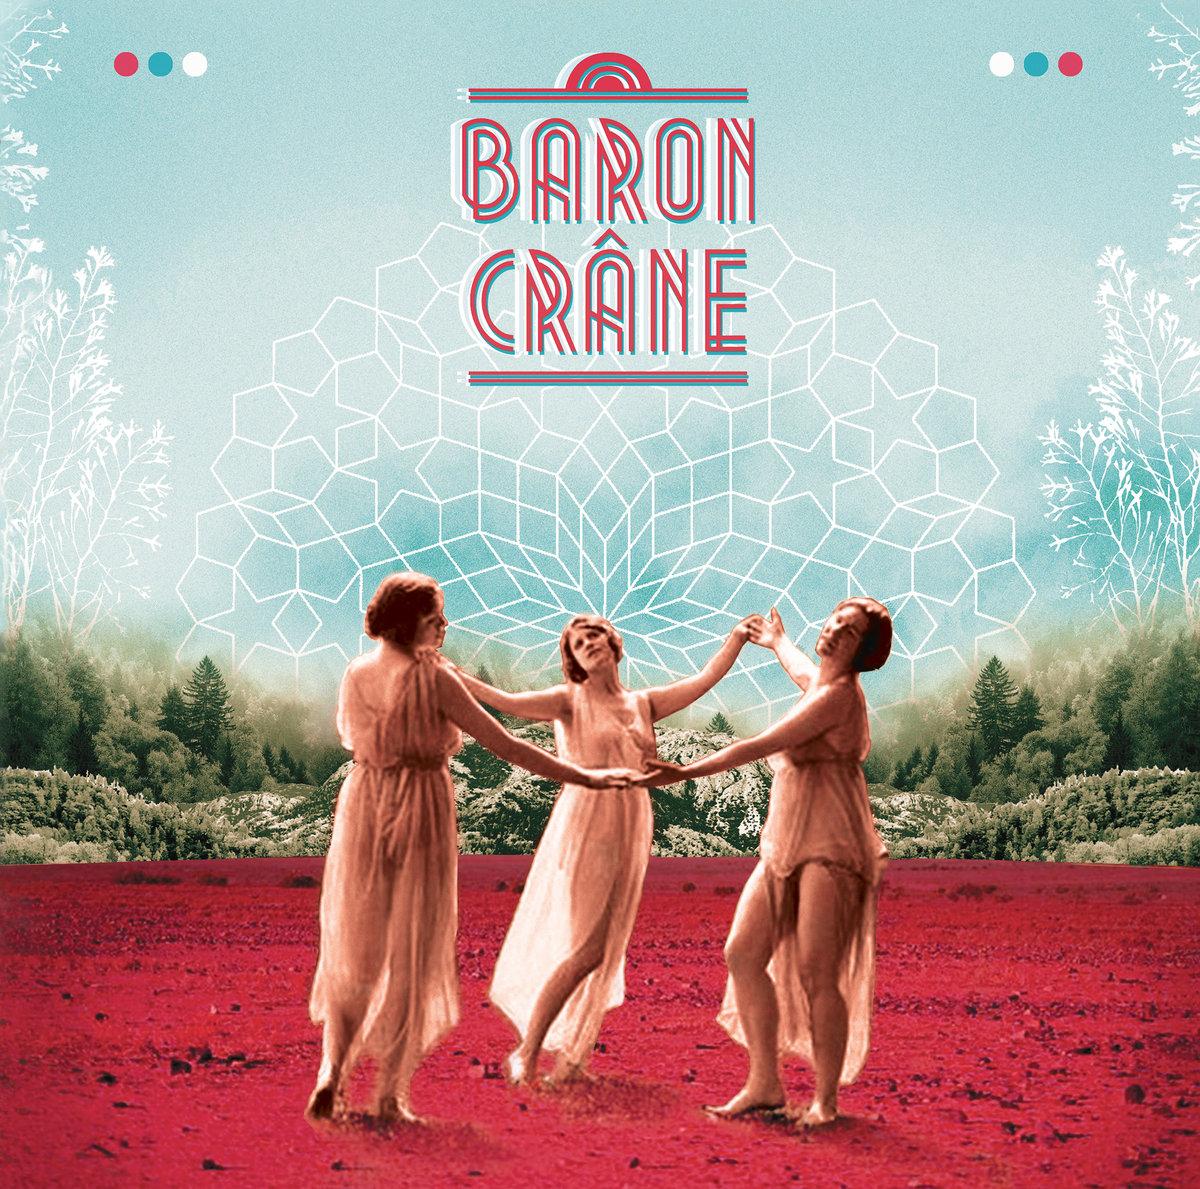 12. Baron Crane - Electric Shades